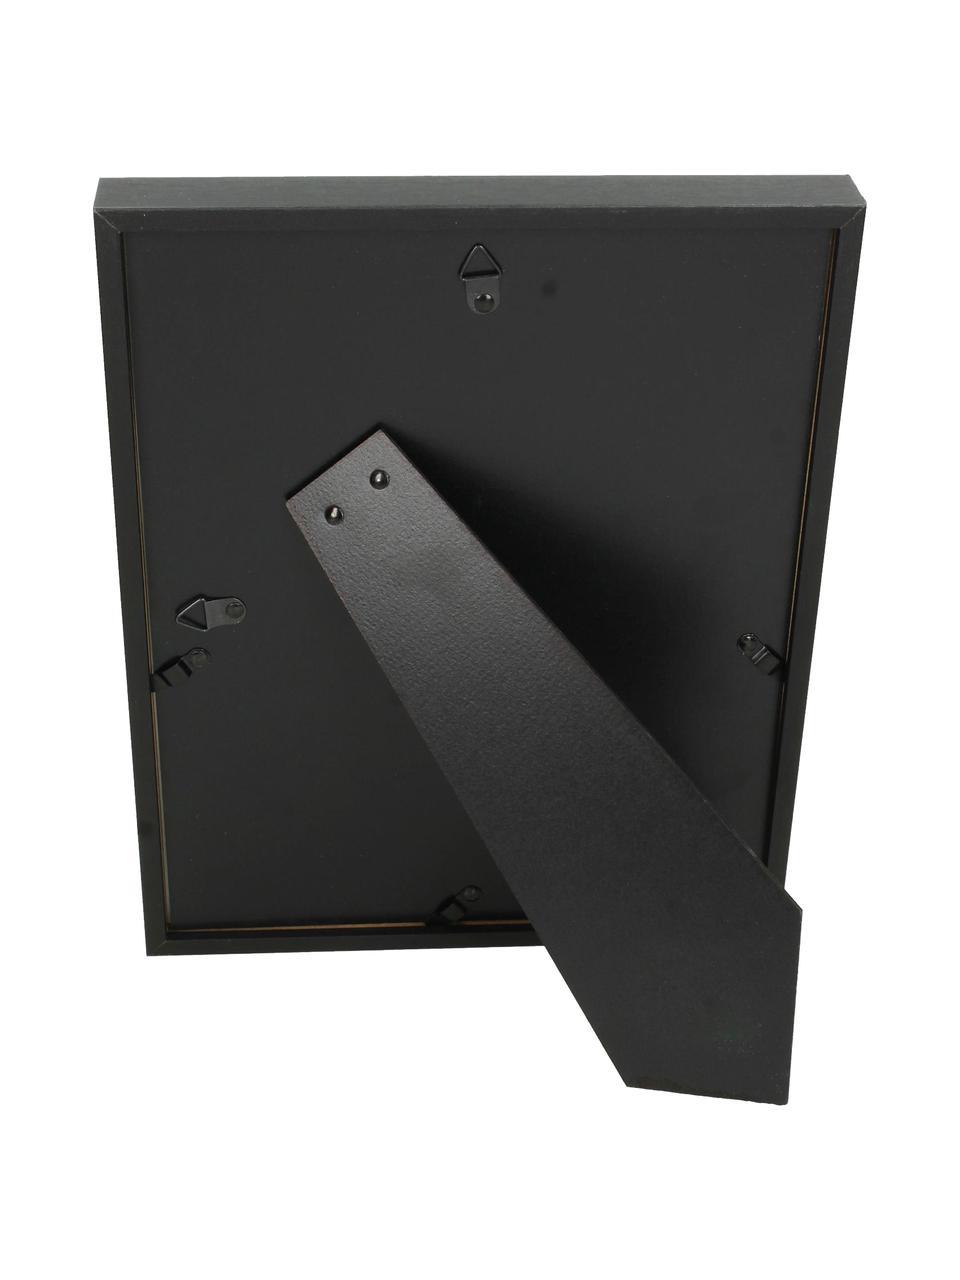 Ramka na zdjęcia Andesine, Czarny, S 20 x D 25 cm